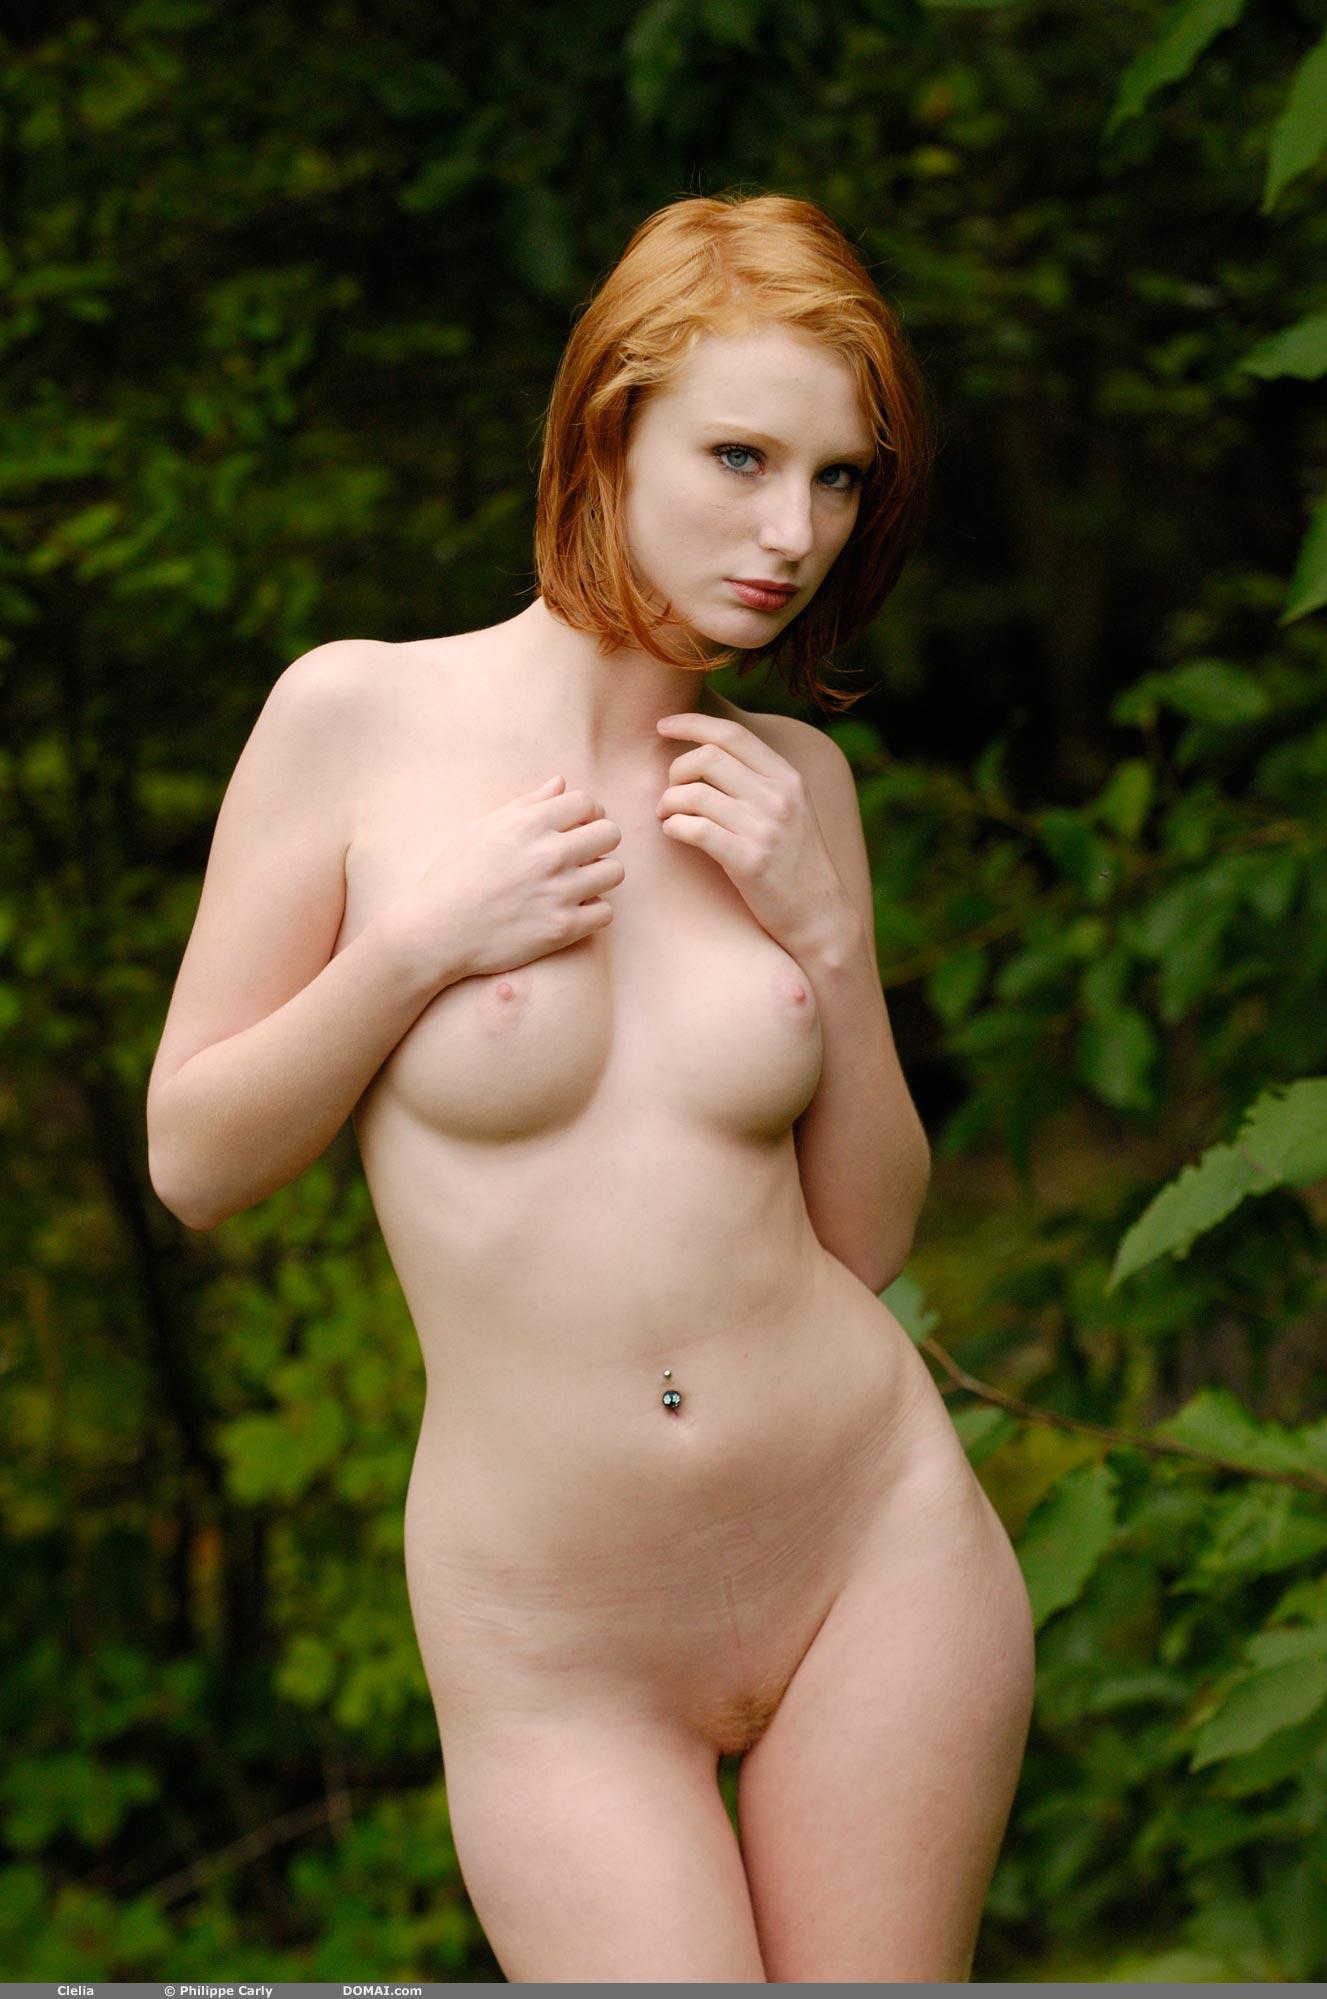 Clelia Playful Redhead - NudesPuri.com